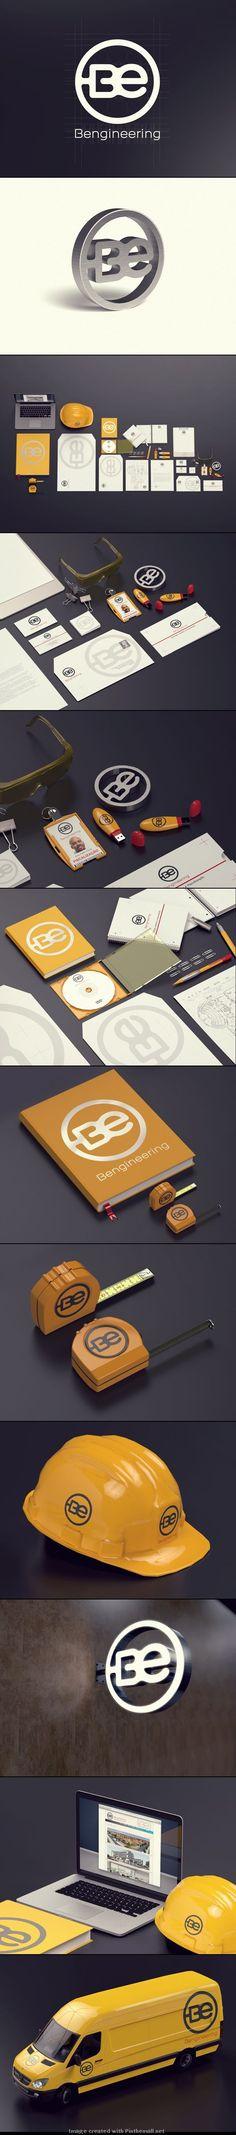 BE BENGINEERING Brand design by Artur Carvalho